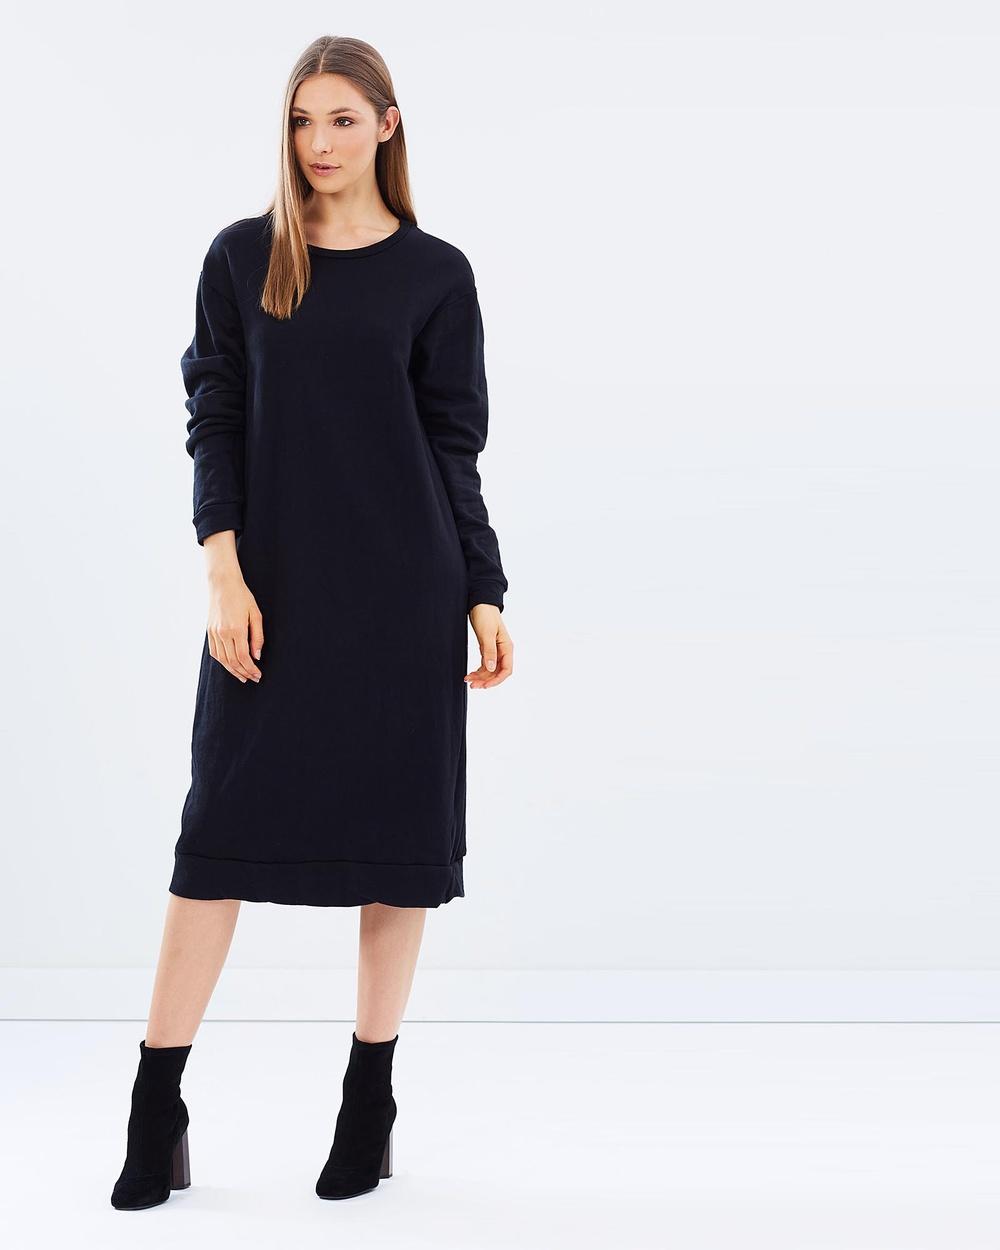 Primness Noir Nexty Jumper Dress